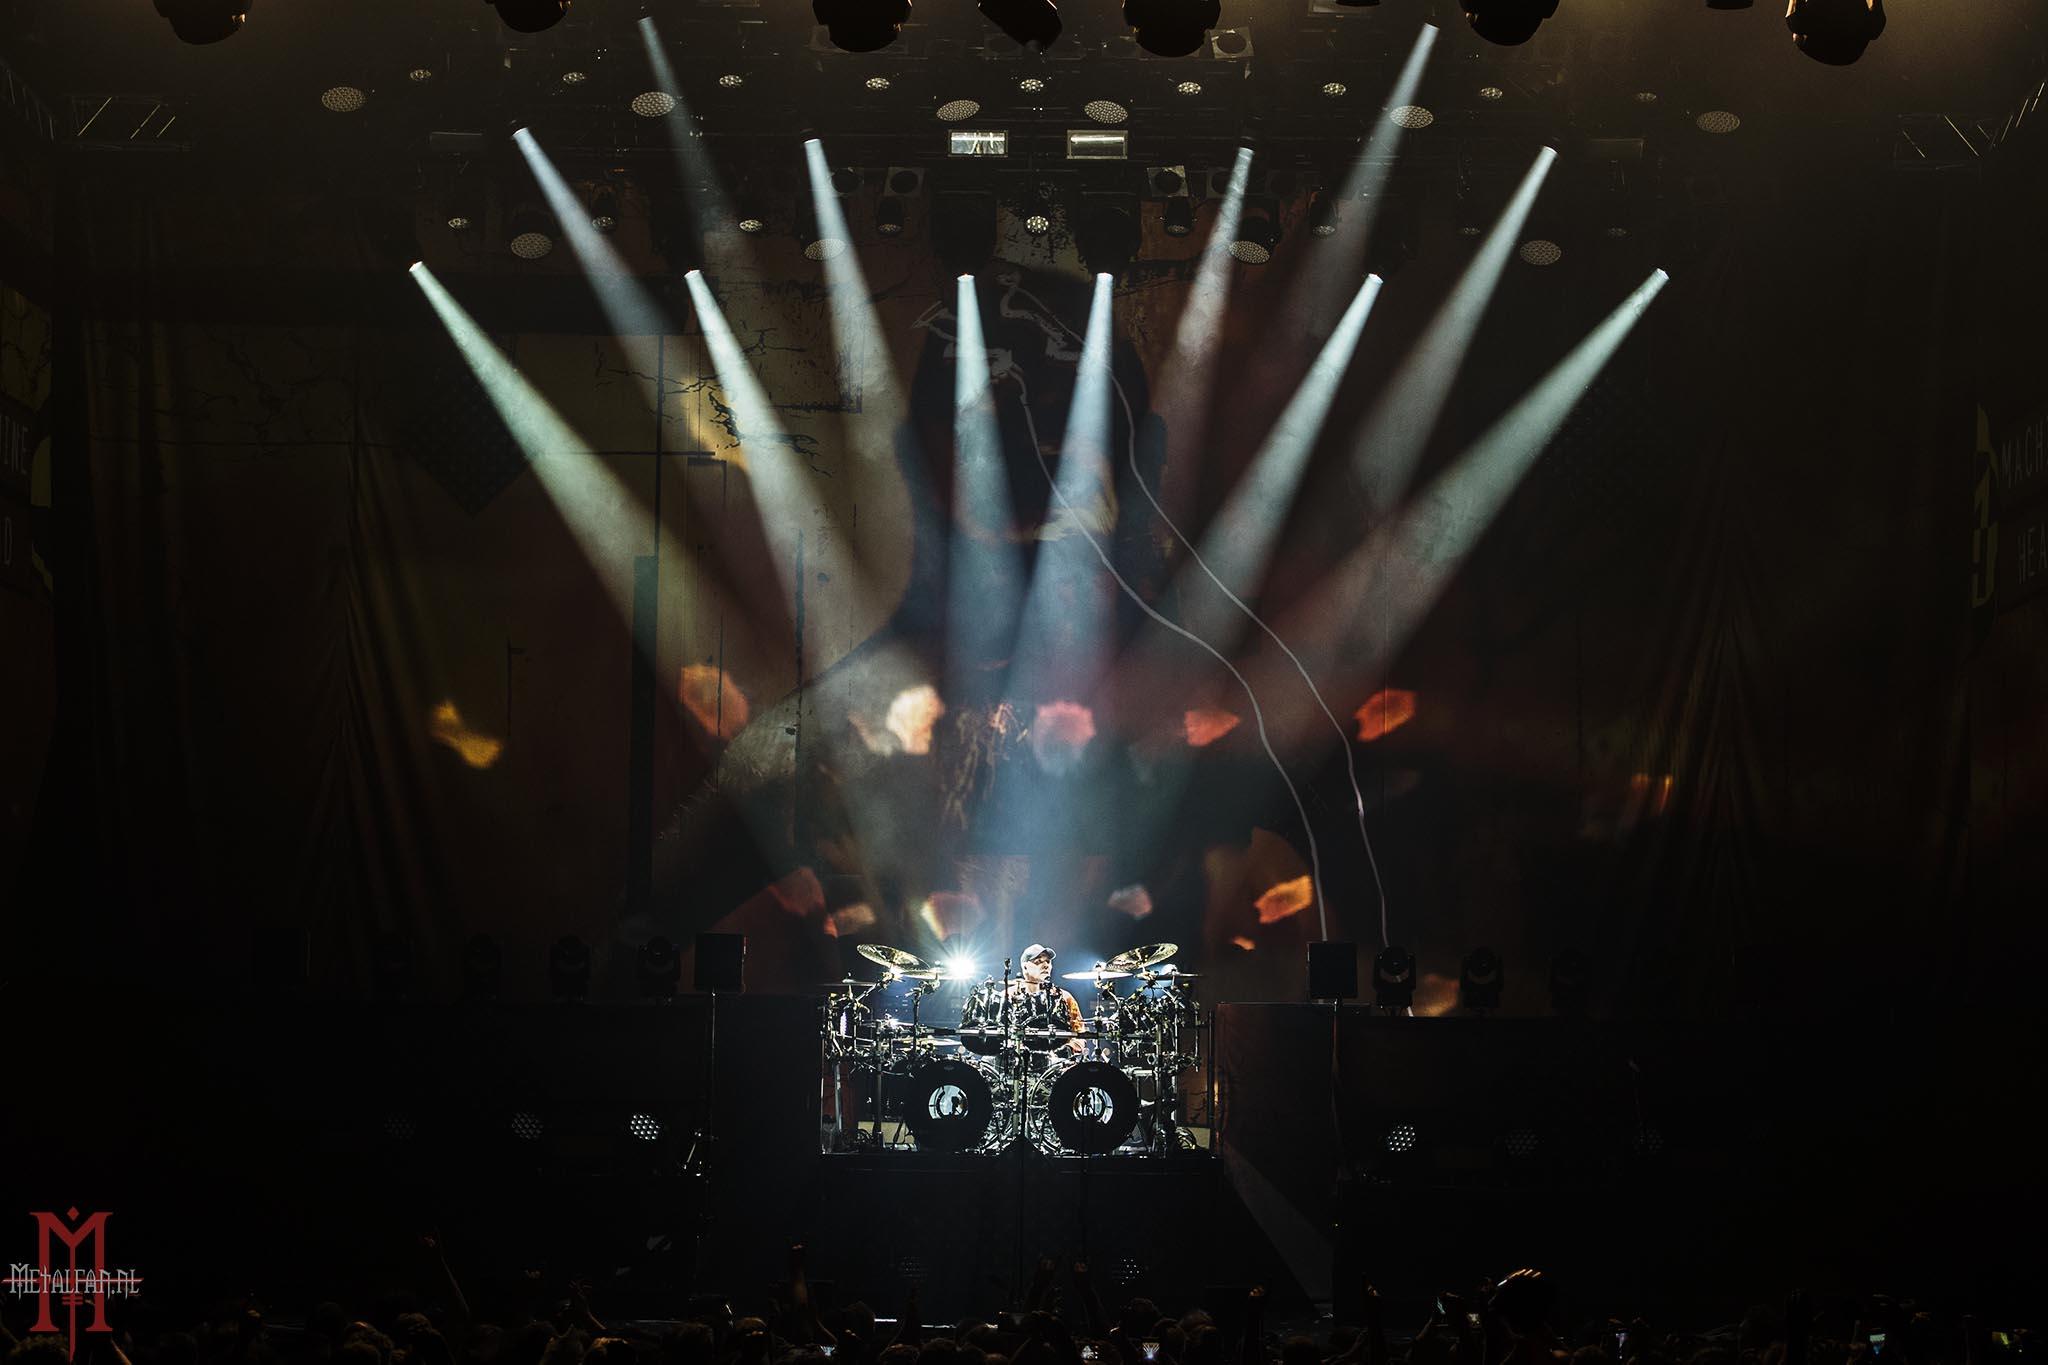 Machine Head @ Poppodium 013, Tilburg, 7-10-2019